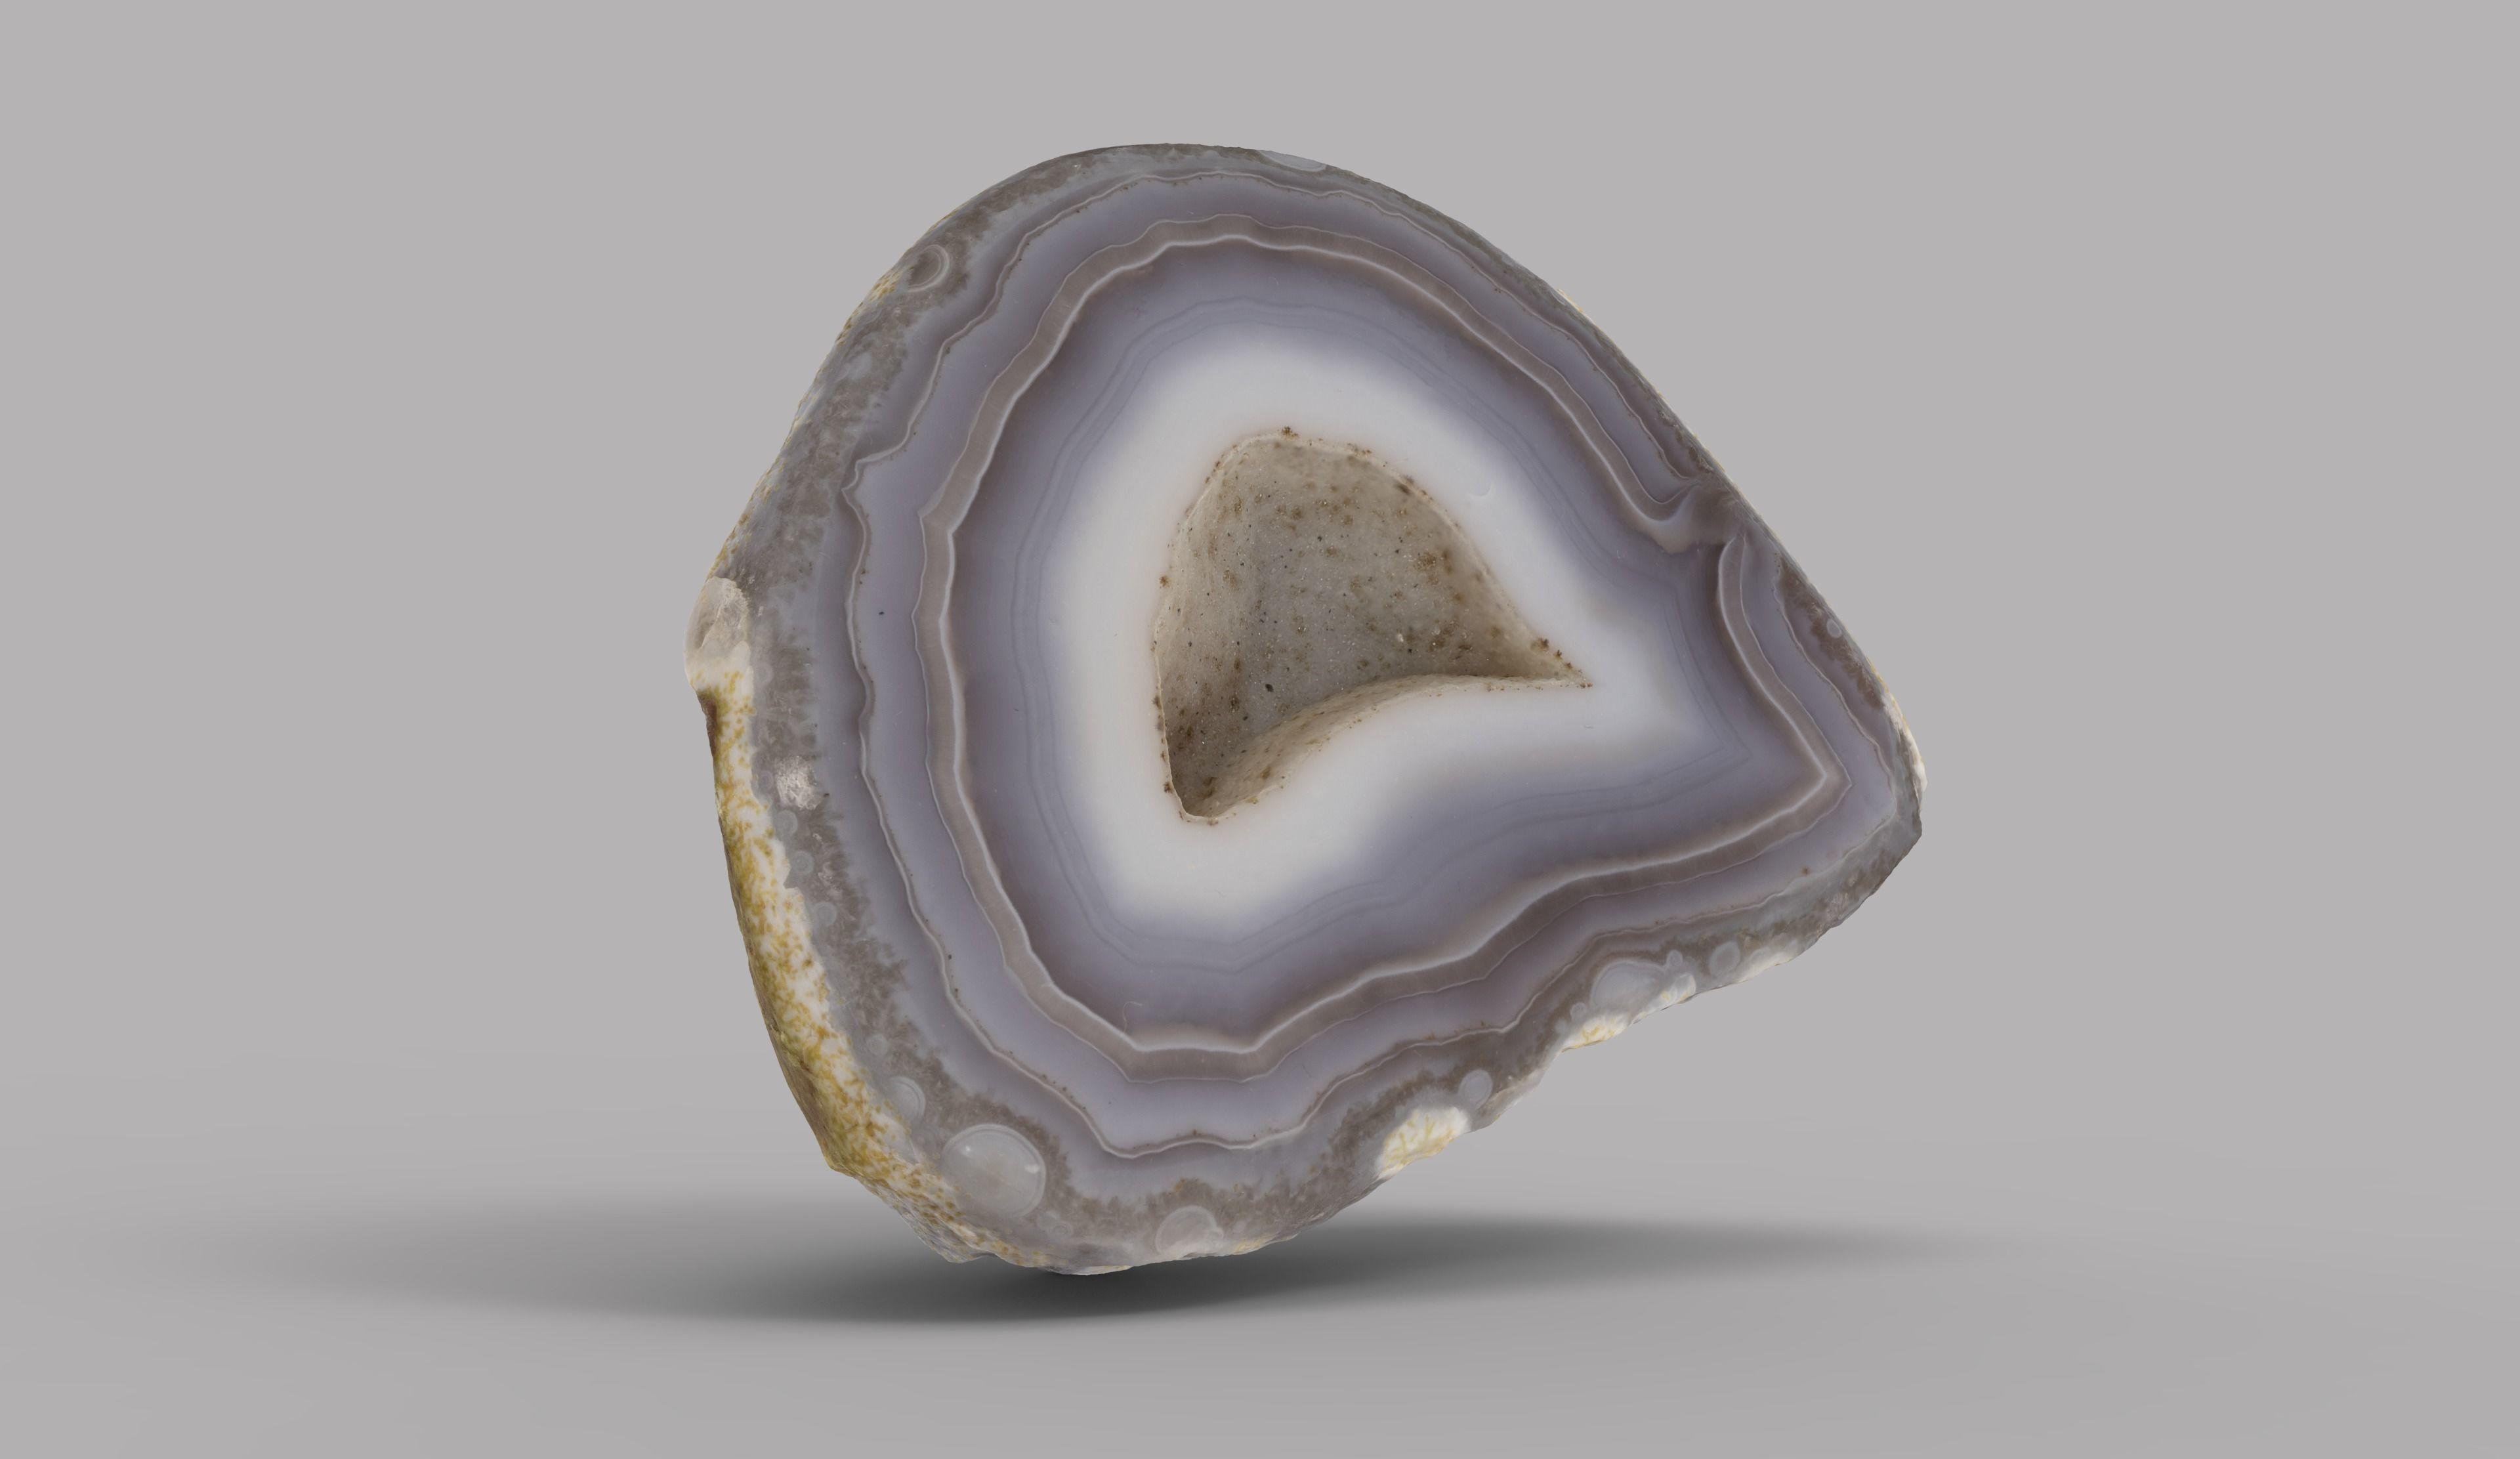 3d scan of Agate gem